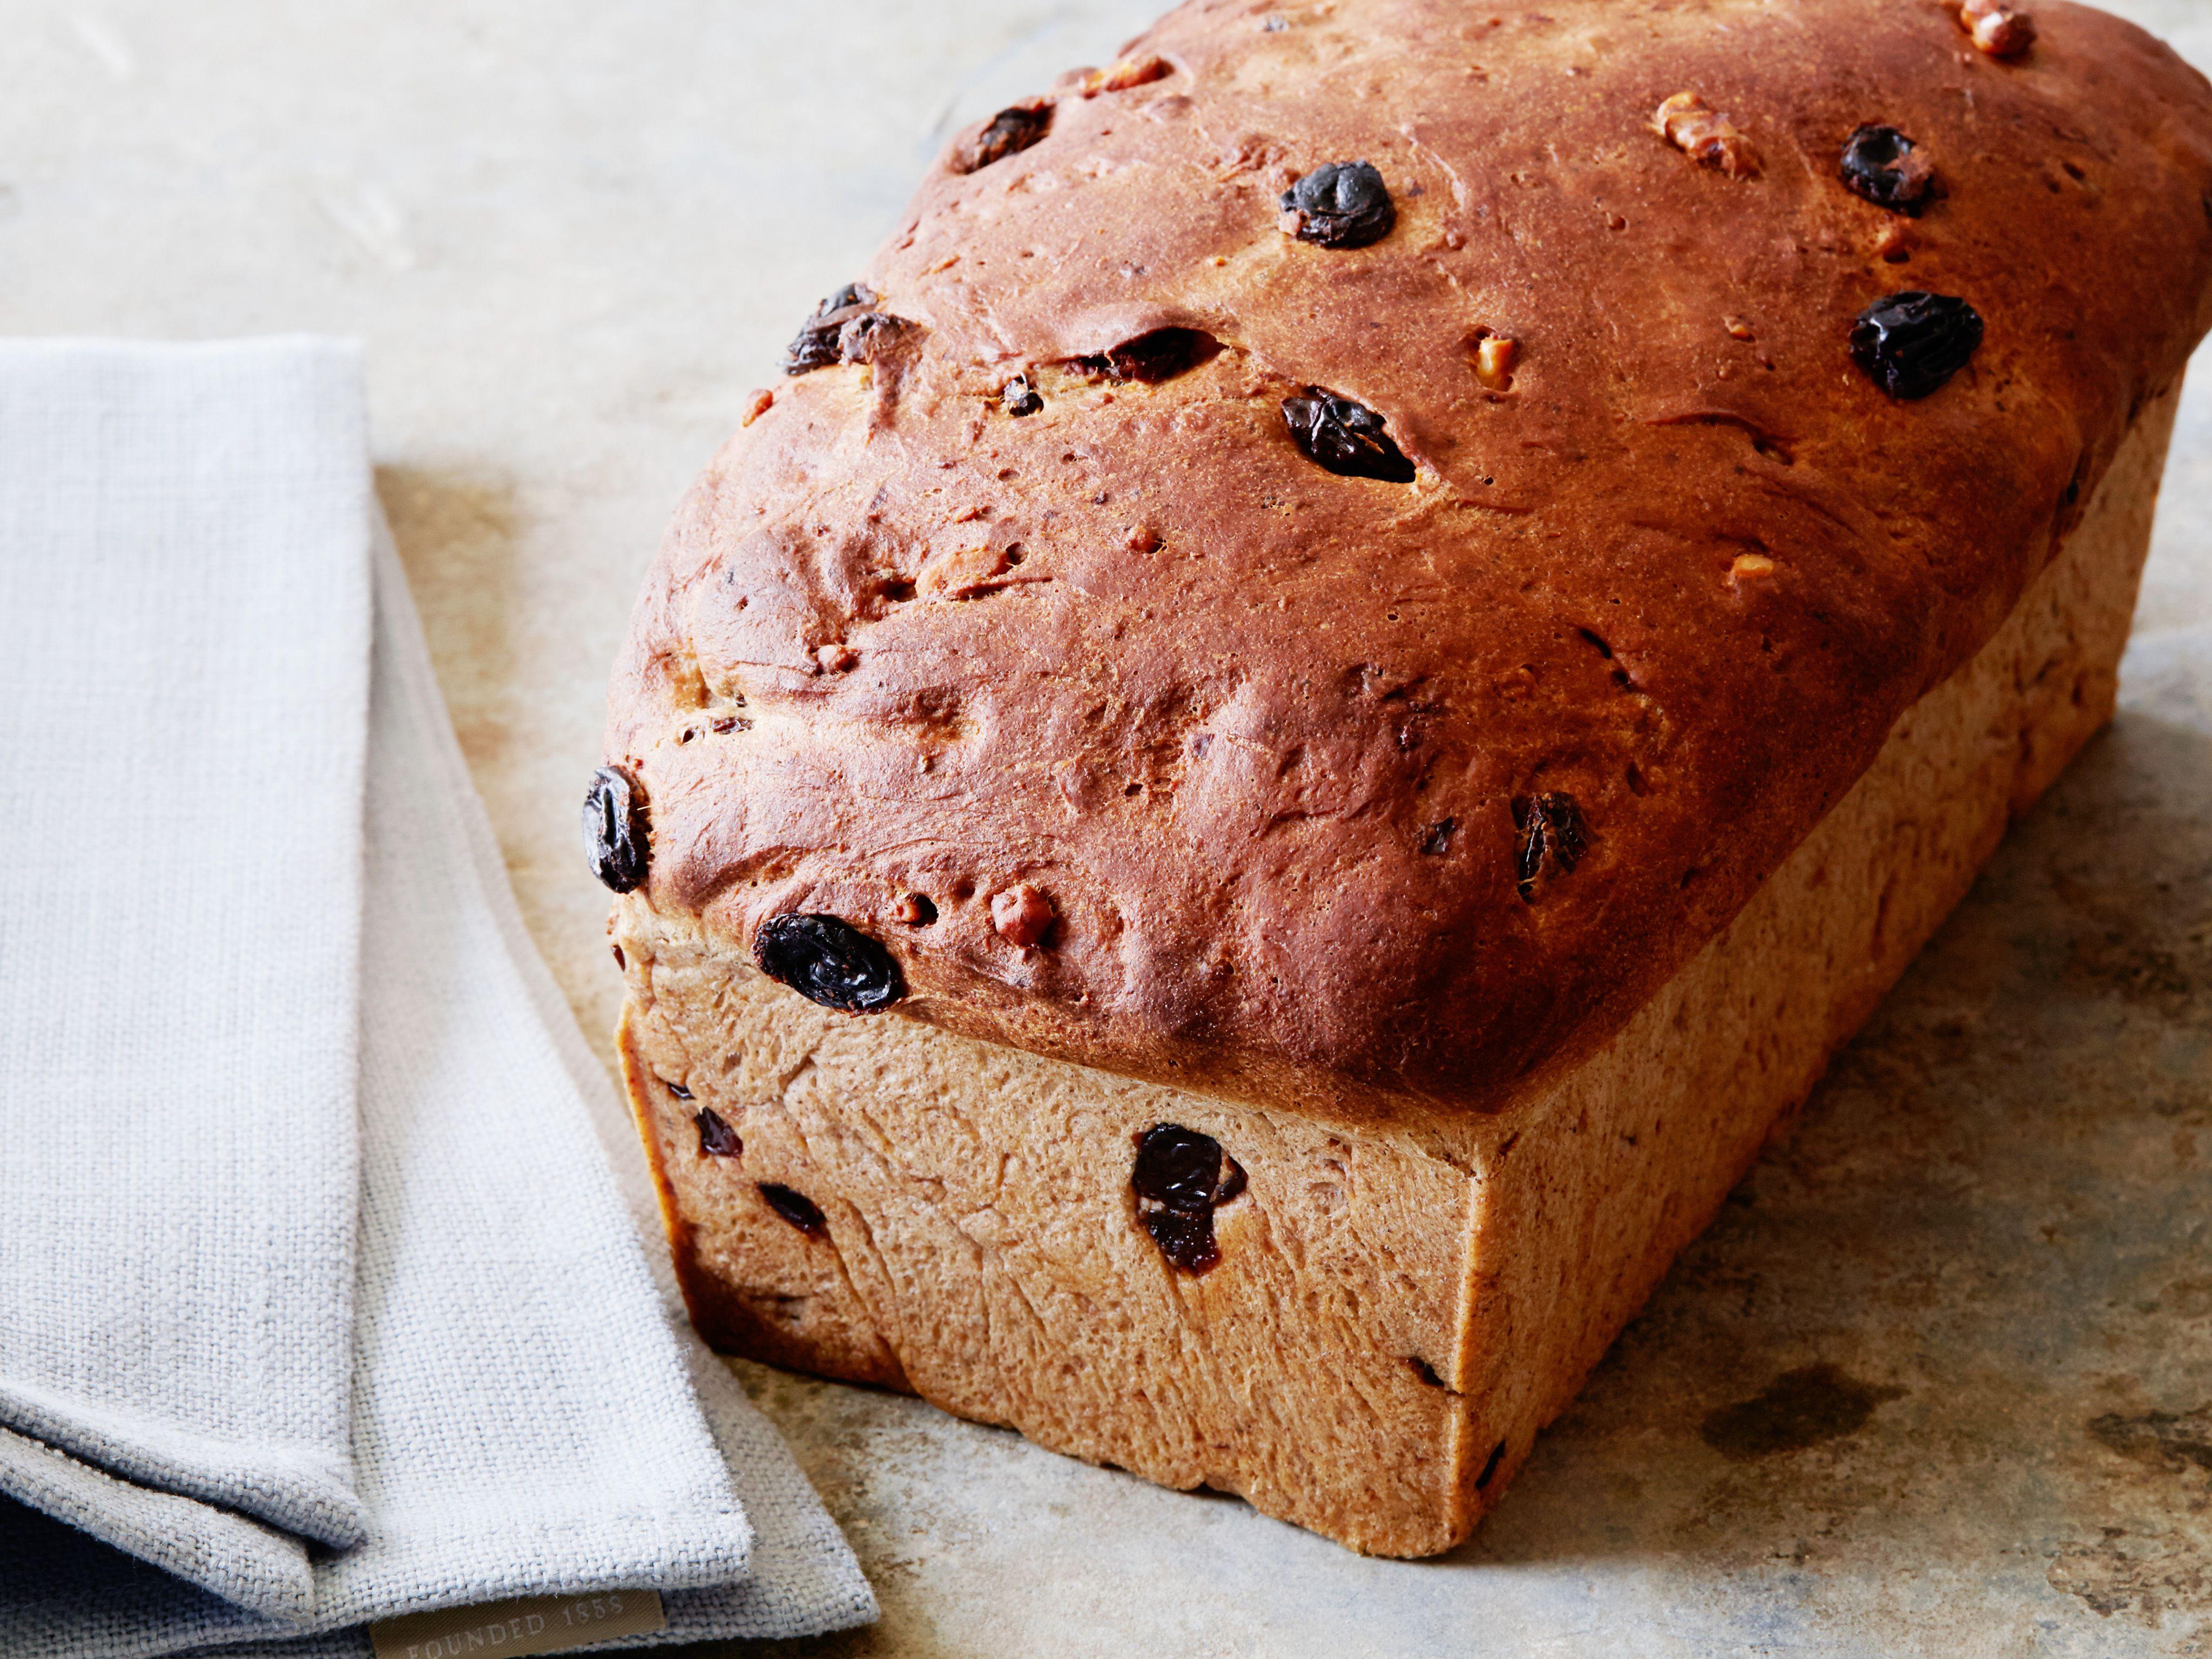 Homemade cinnamon raisin bread recipe cinnamon raisin bread homemade cinnamon raisin bread forumfinder Images